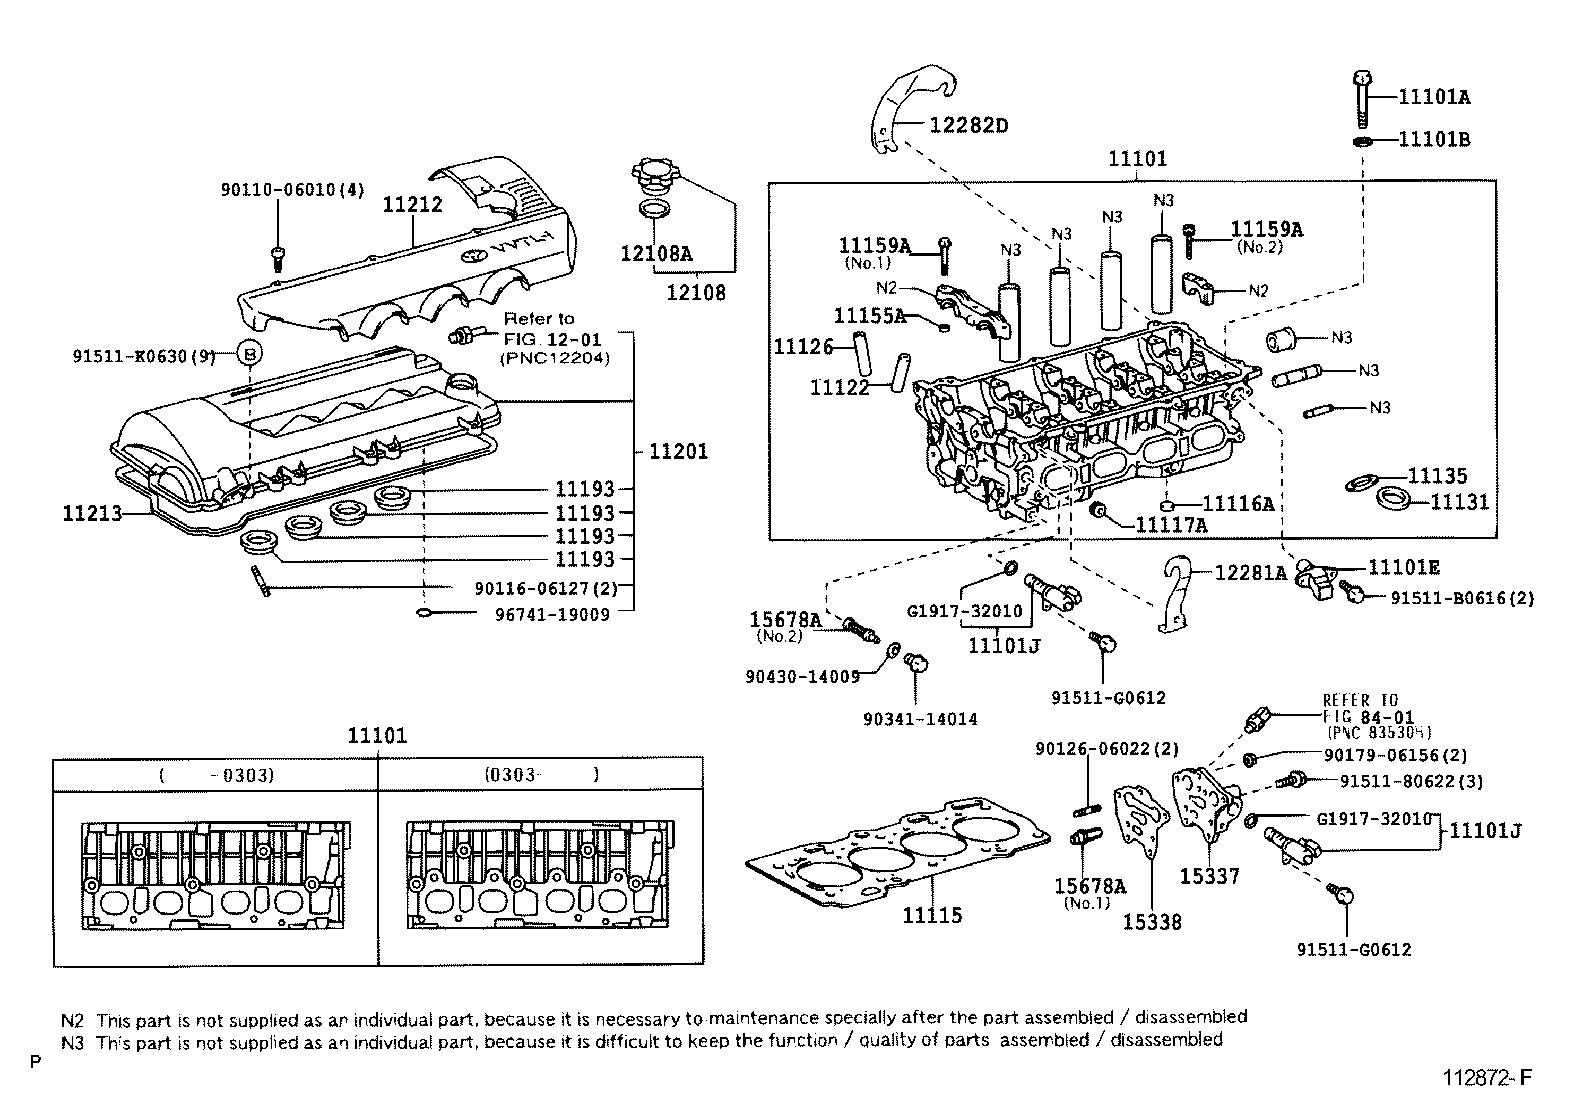 toyota celicazzt231l-blfvfa - tool-engine-fuel